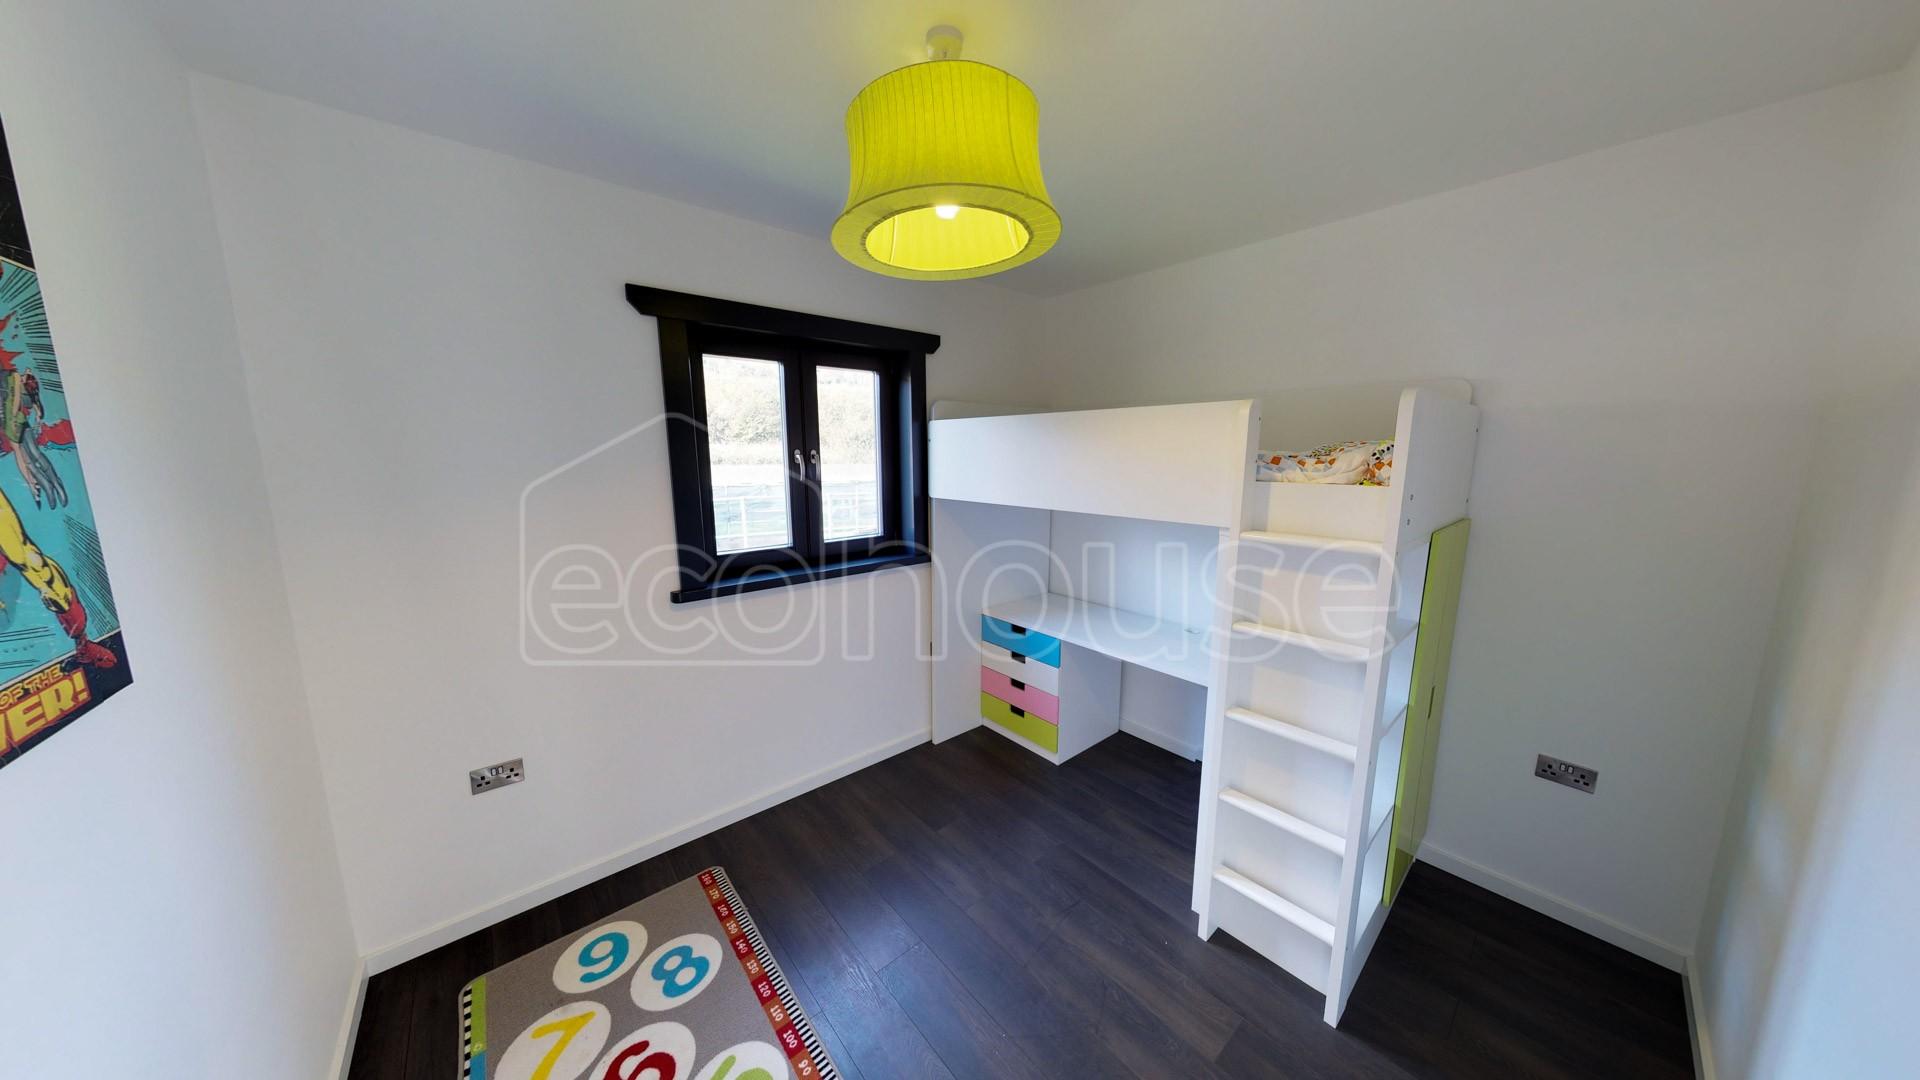 Ecohouse Showroom